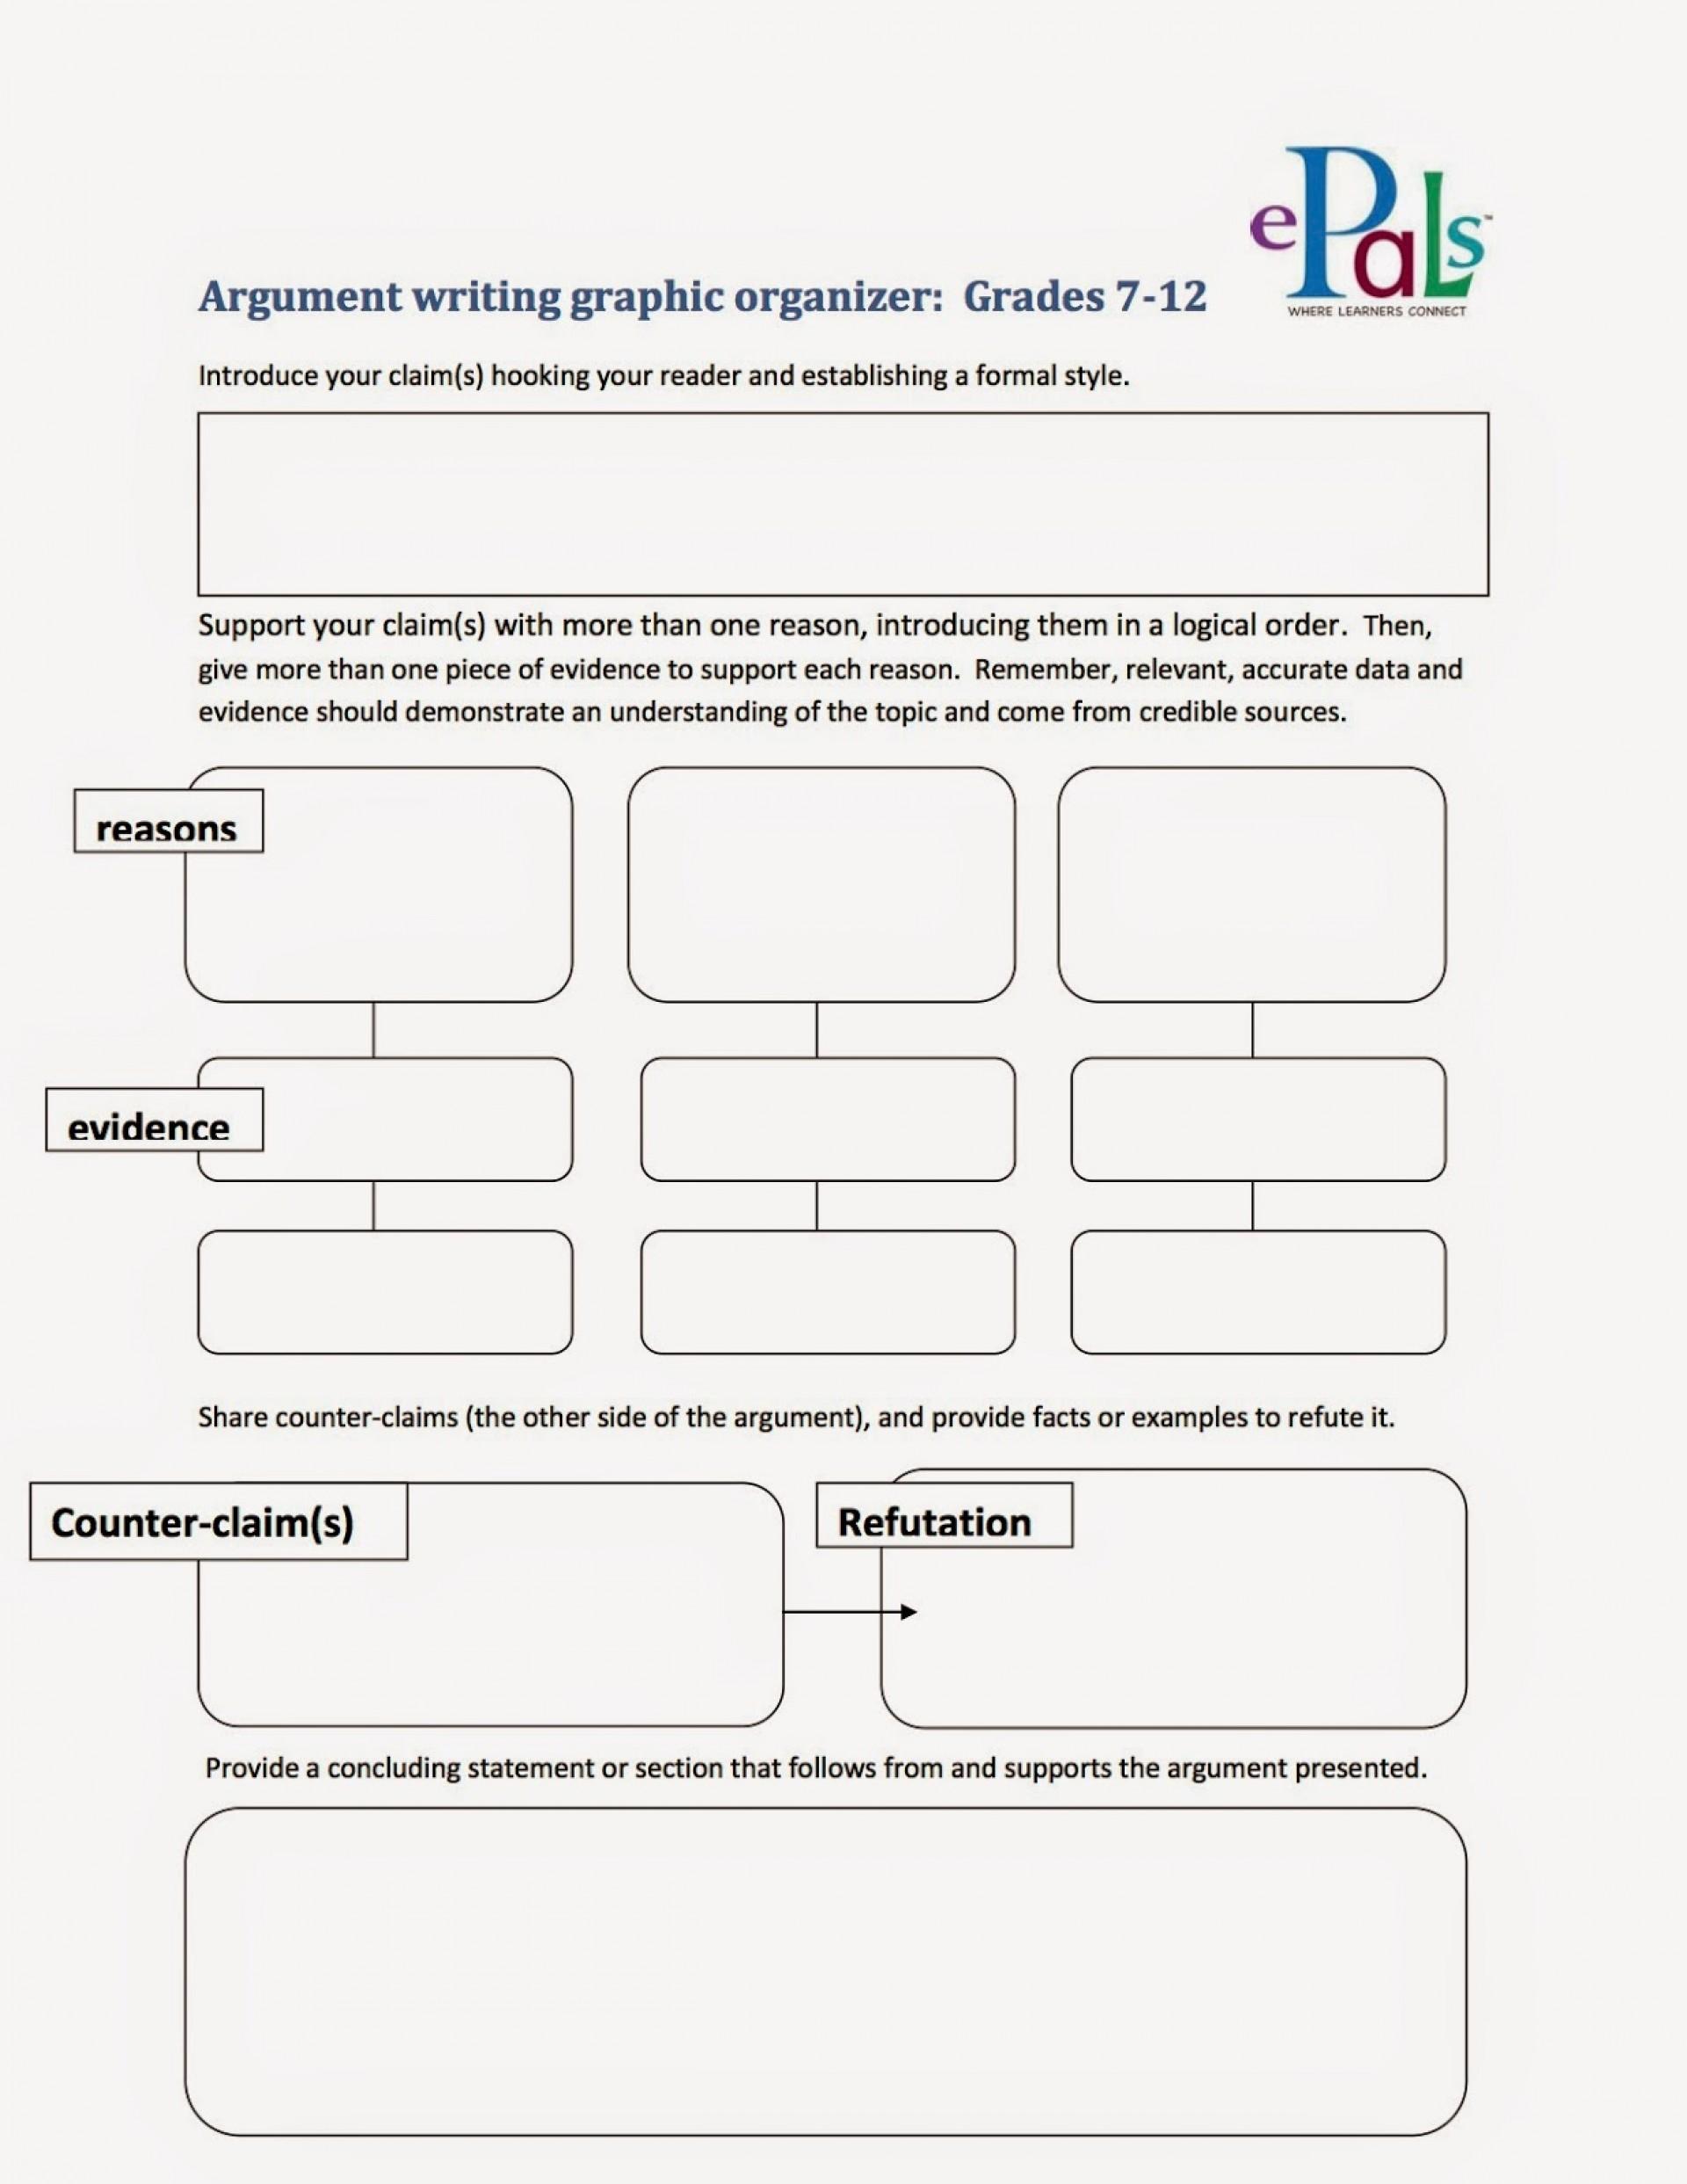 005 Argumentgraphicorganizer2bcopy Argument Essay Graphic Organizer Breathtaking Argumentative College Example Persuasive Template 1920